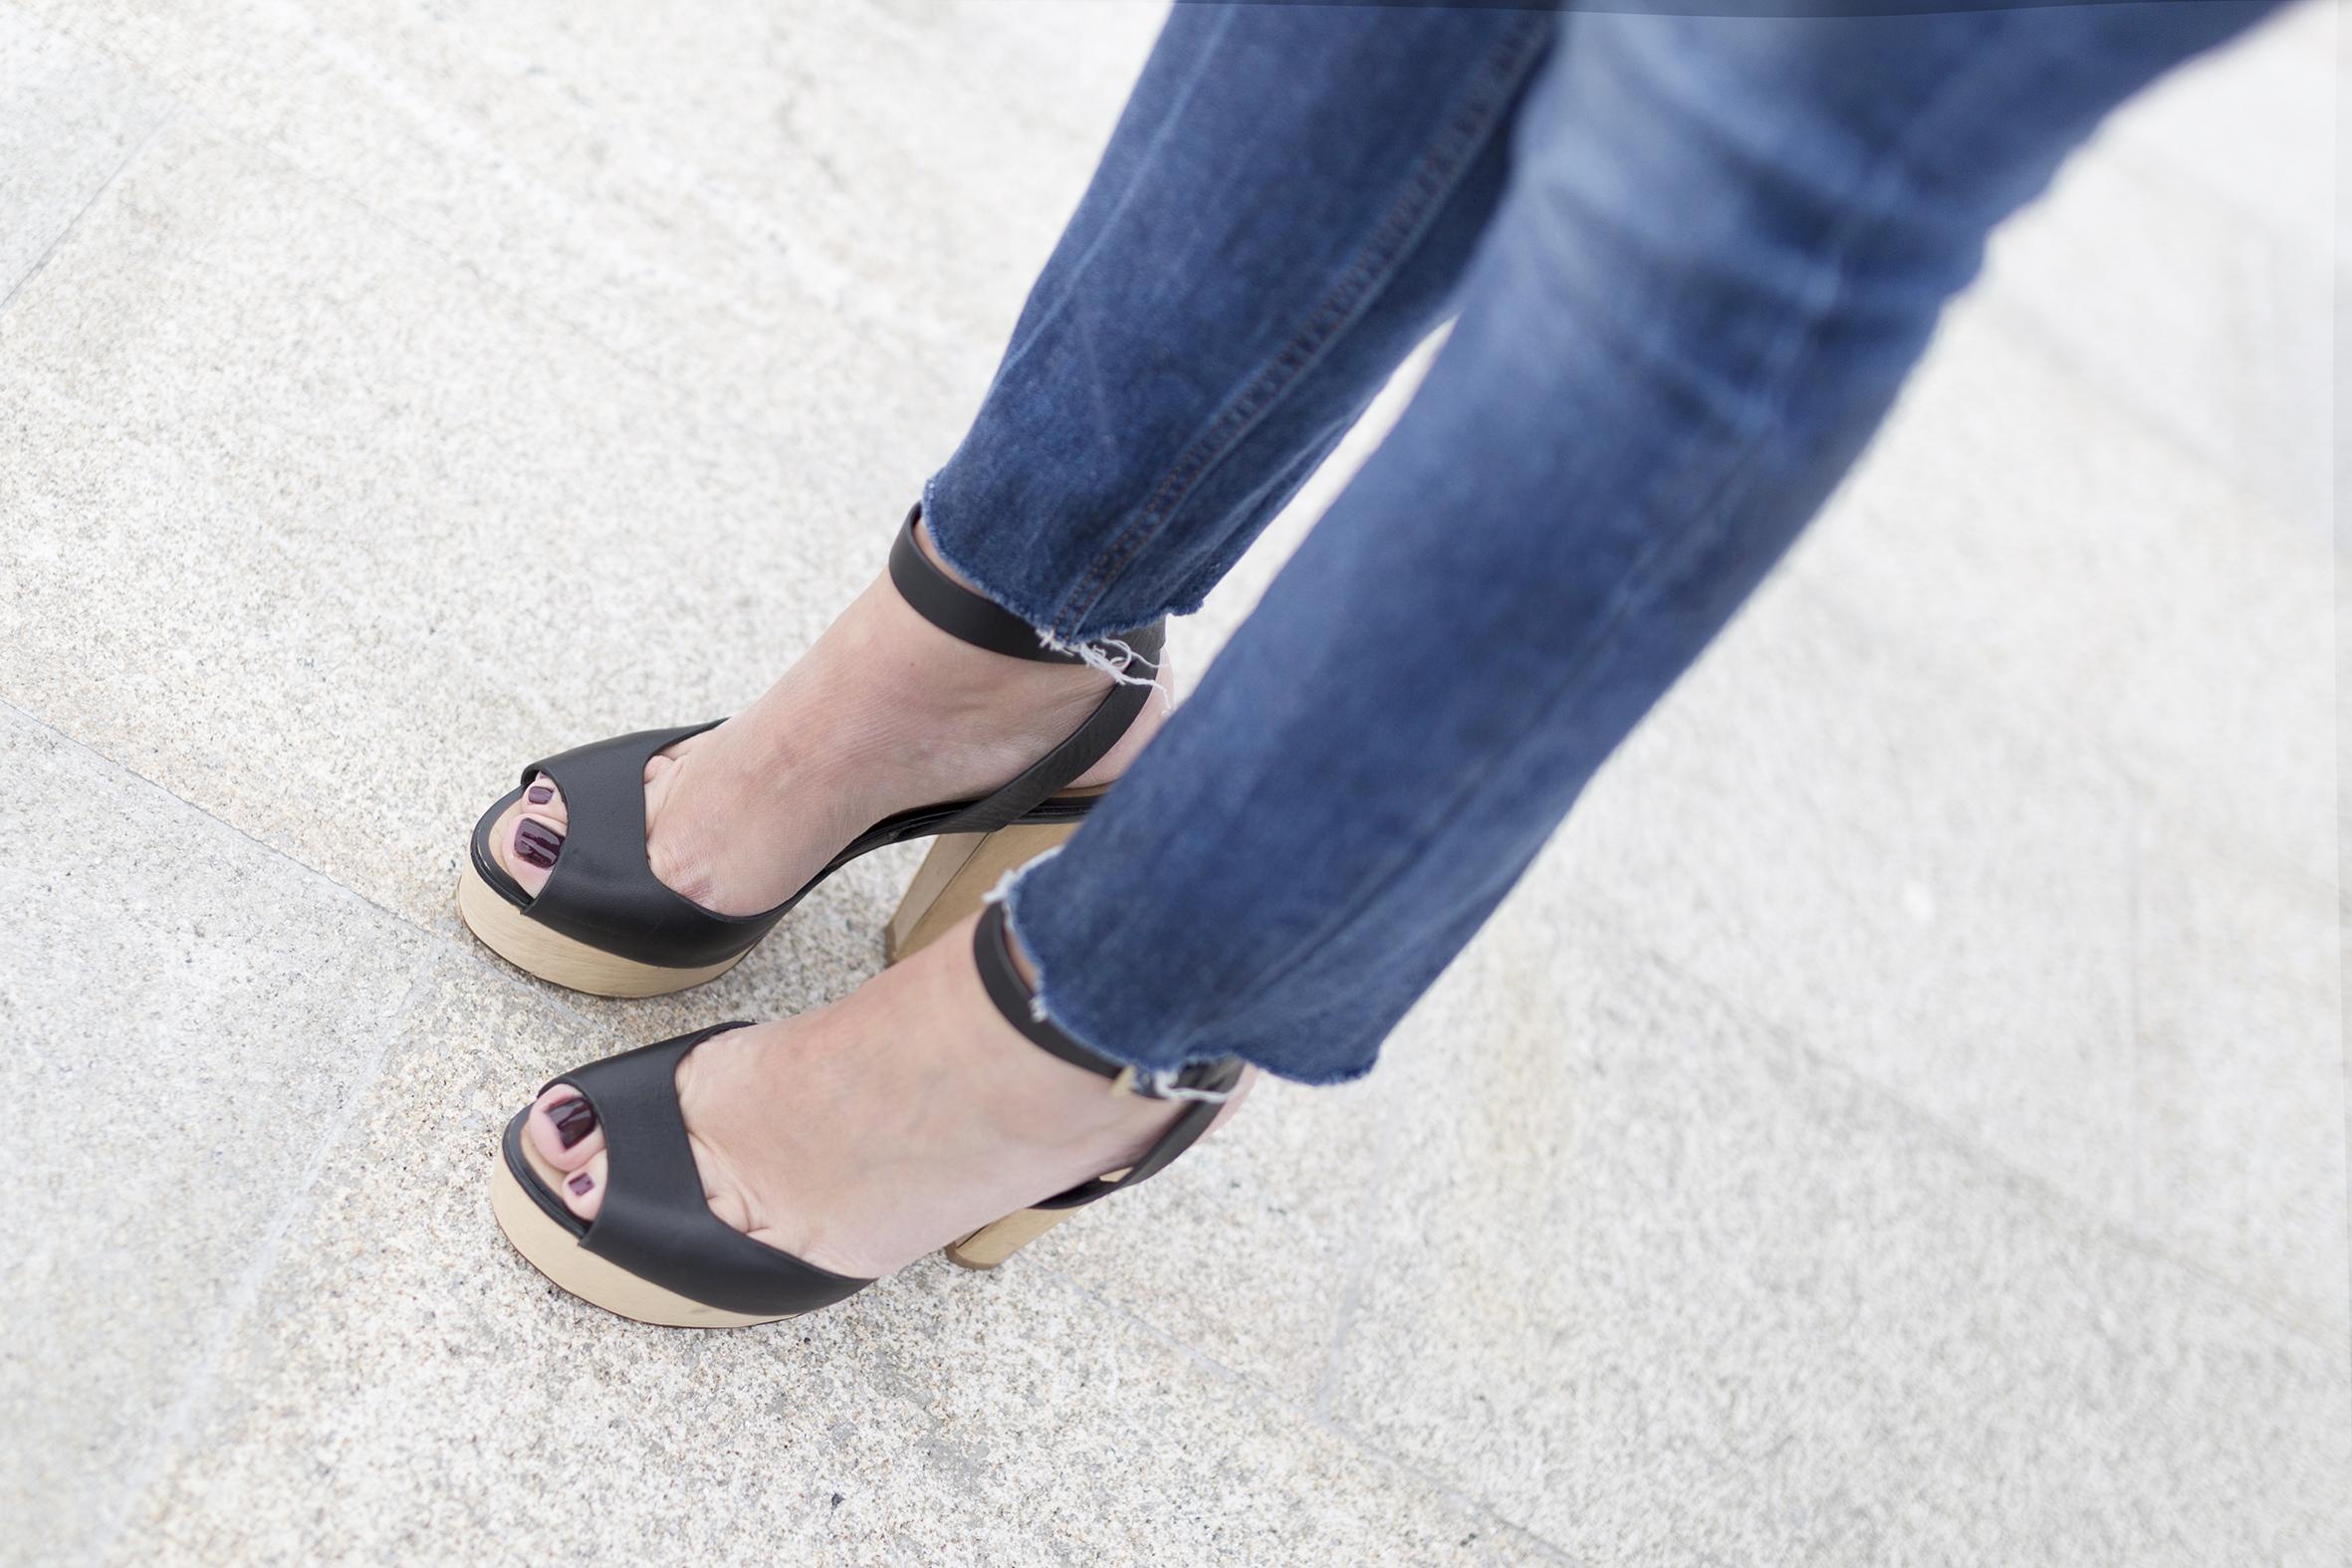 zara-sandals- streetstyle-moda-descalzaporelparque- streetstyle-style- scarf-promod